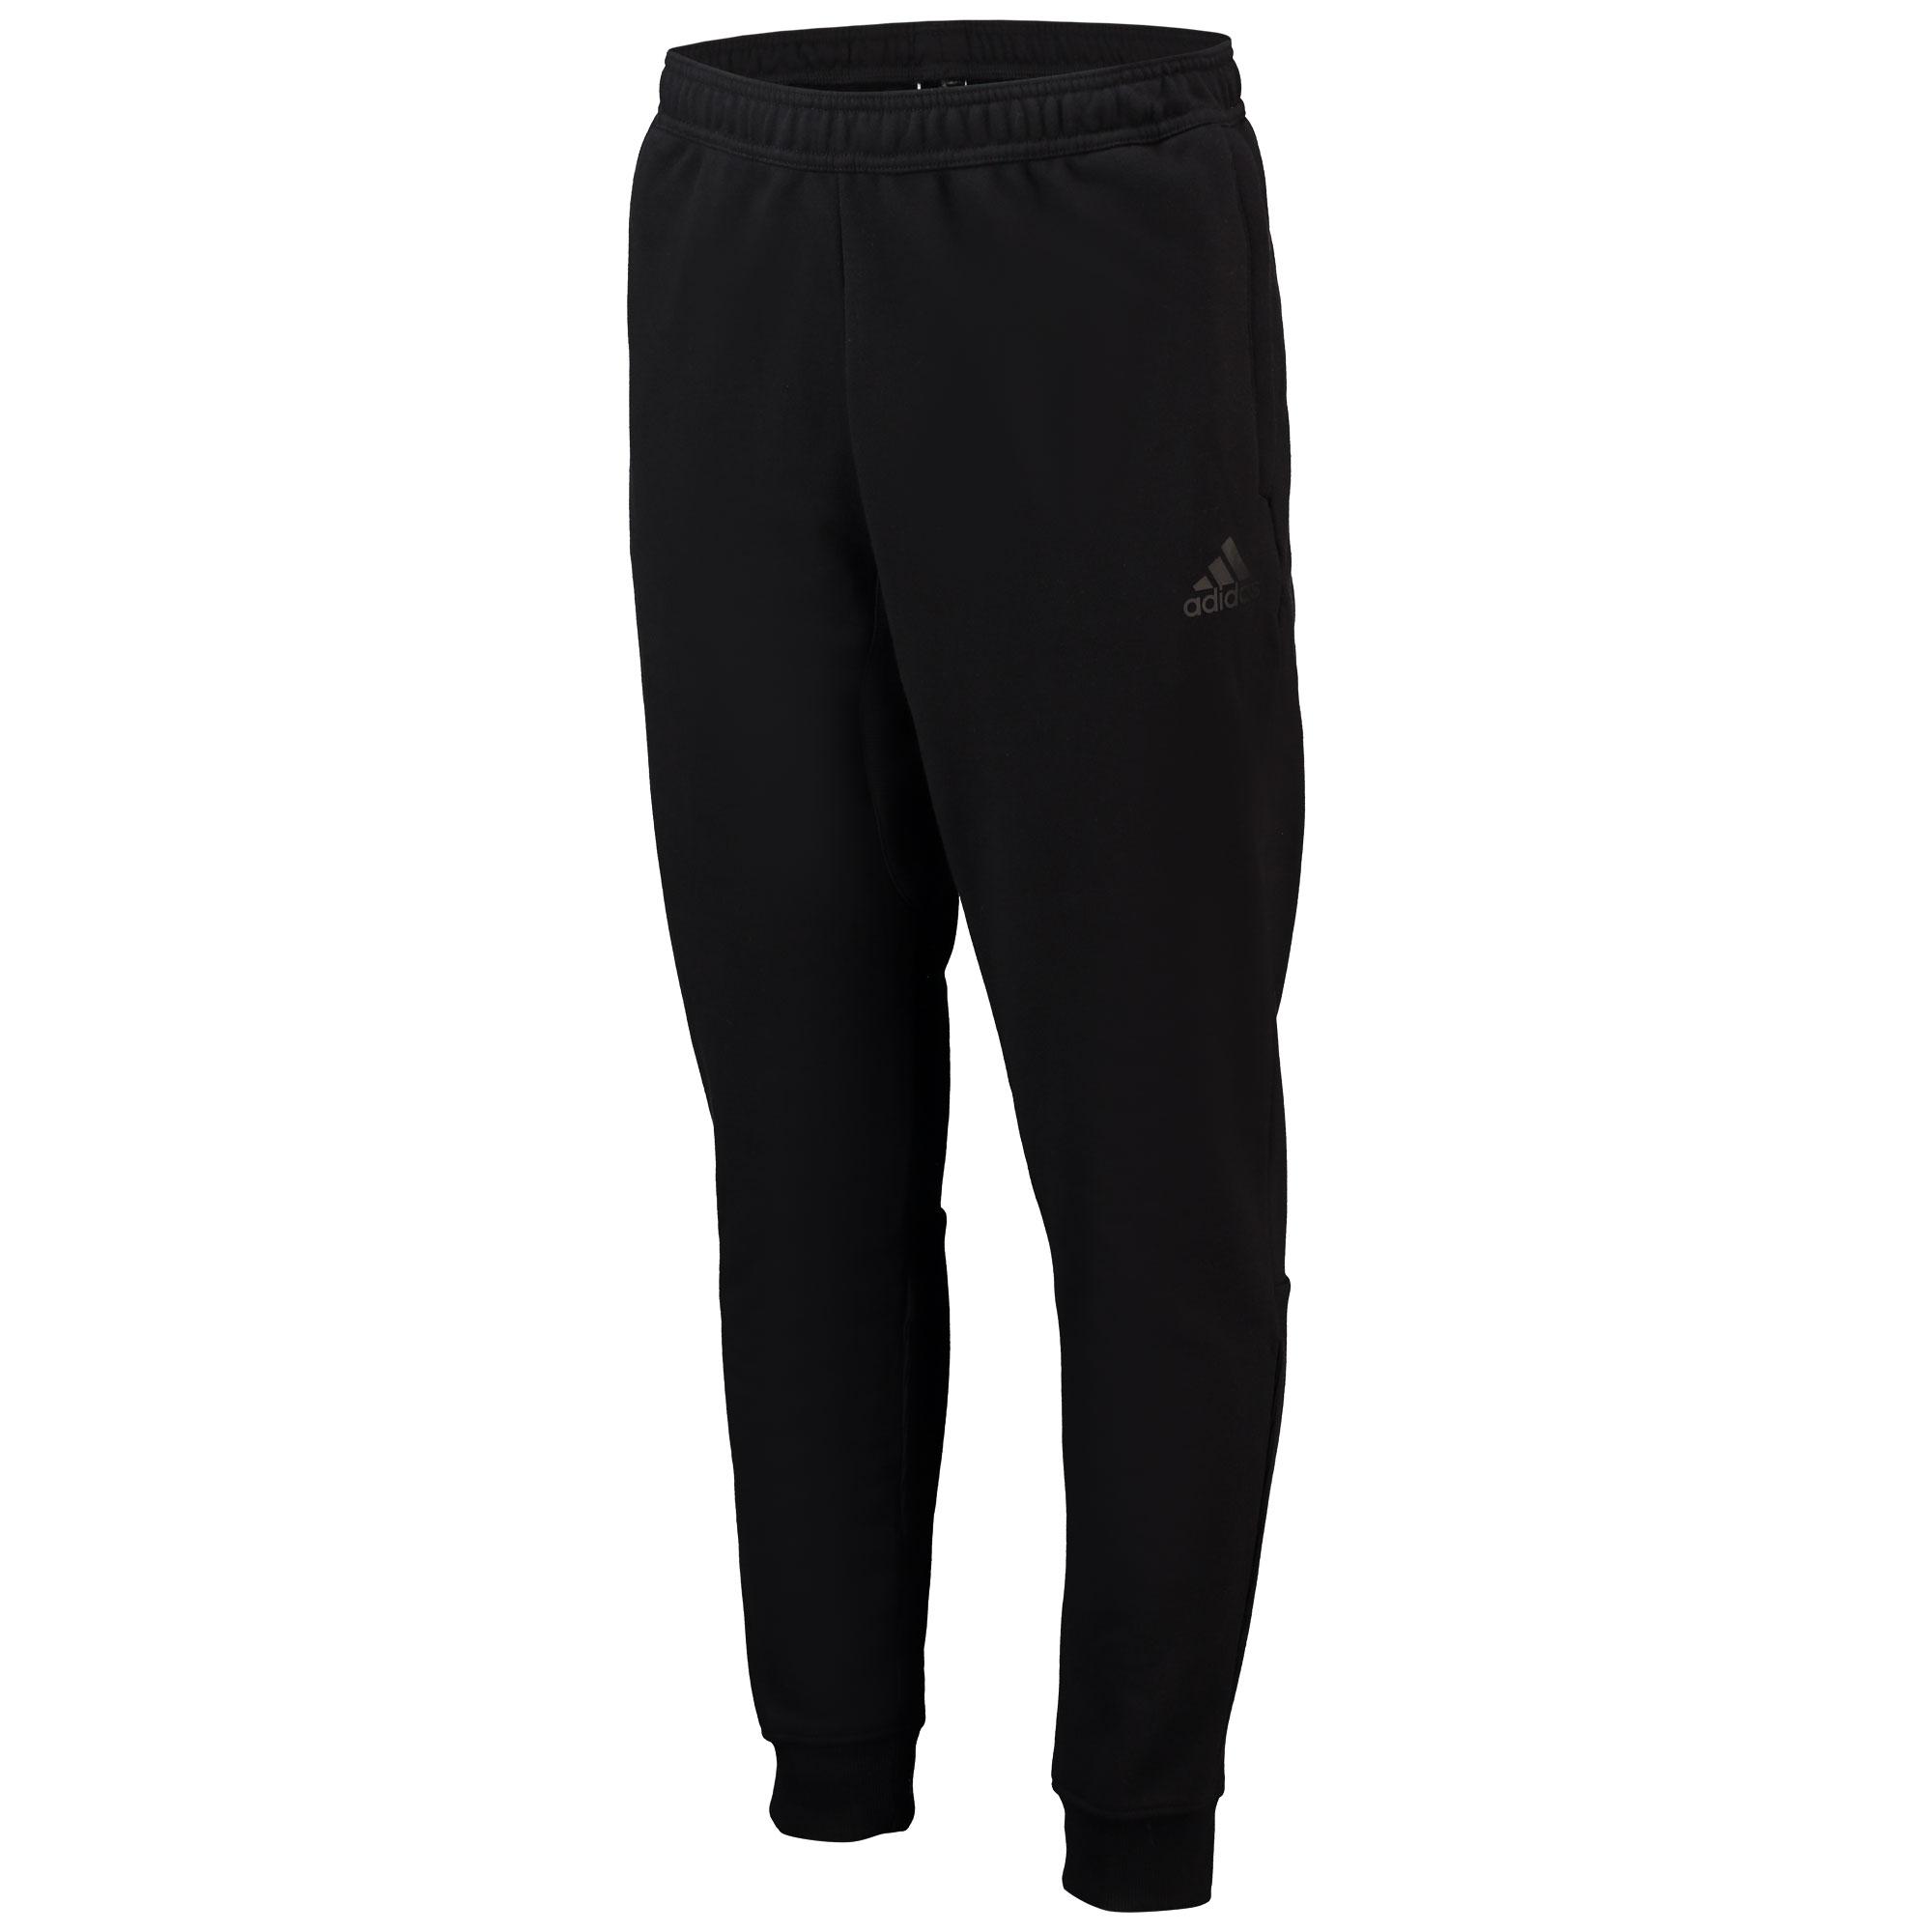 Adidas / Adidas Tango Sweatpants - Black